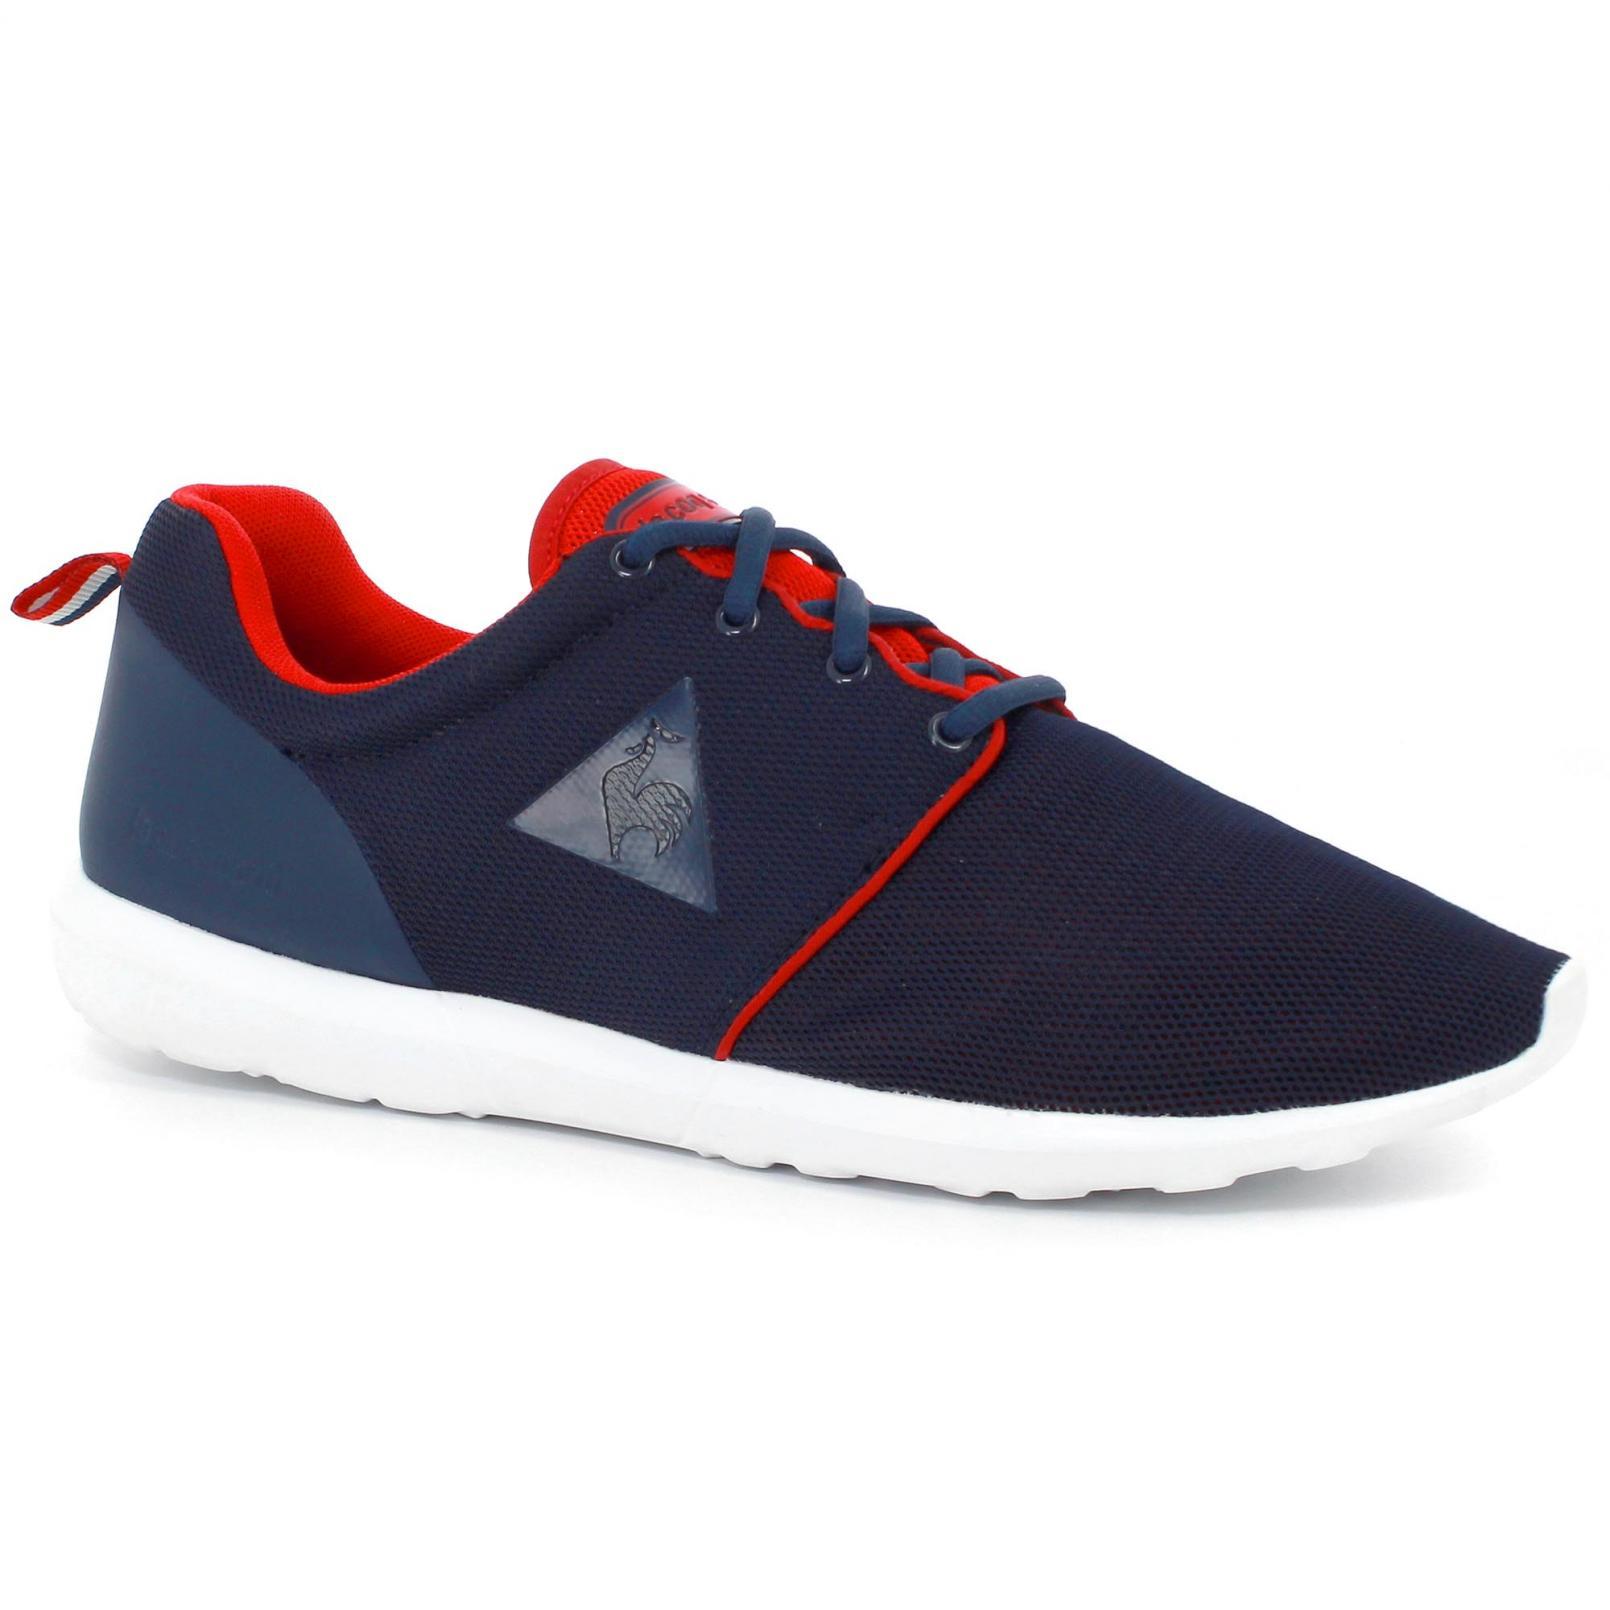 Shoes – Le Coq Sportif Dynacomf Mesh Blue/Red